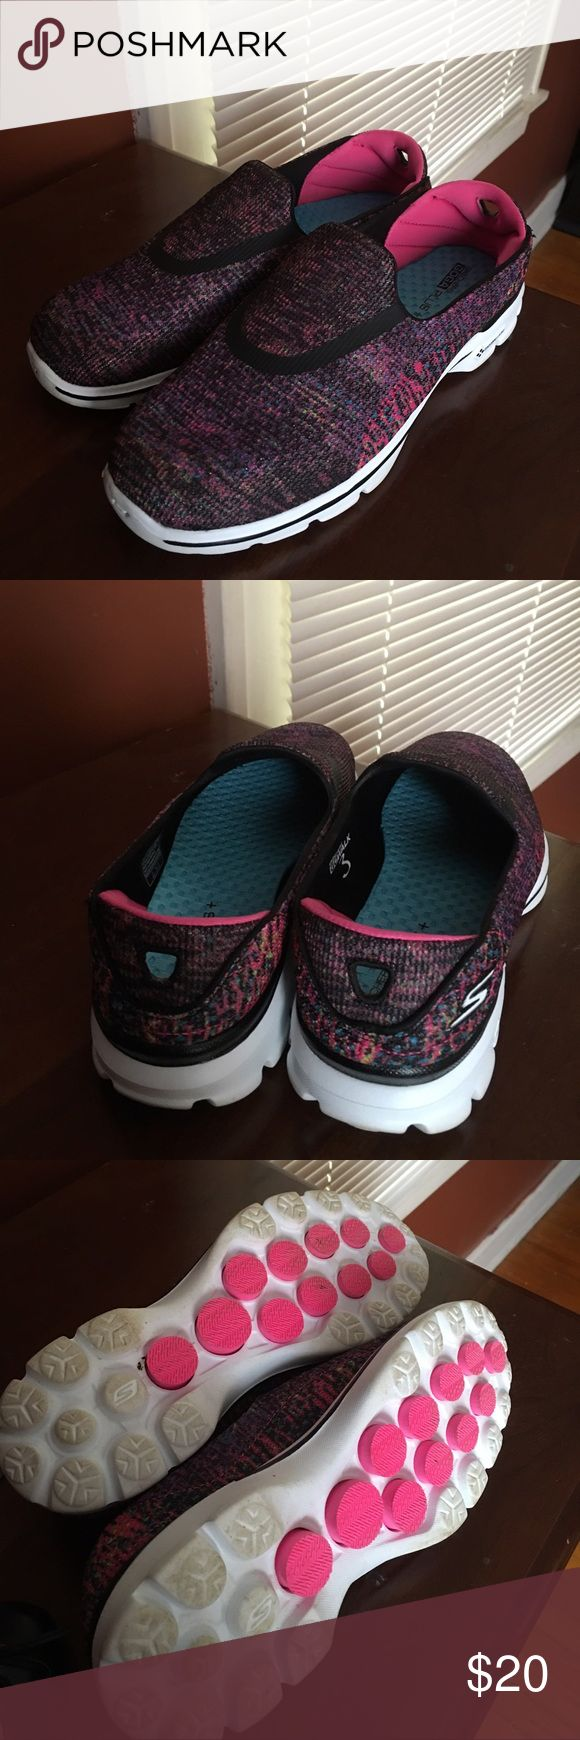 Skechers Go Walk Slip on shoes, worn twice. Skechers Shoes Athletic Shoes